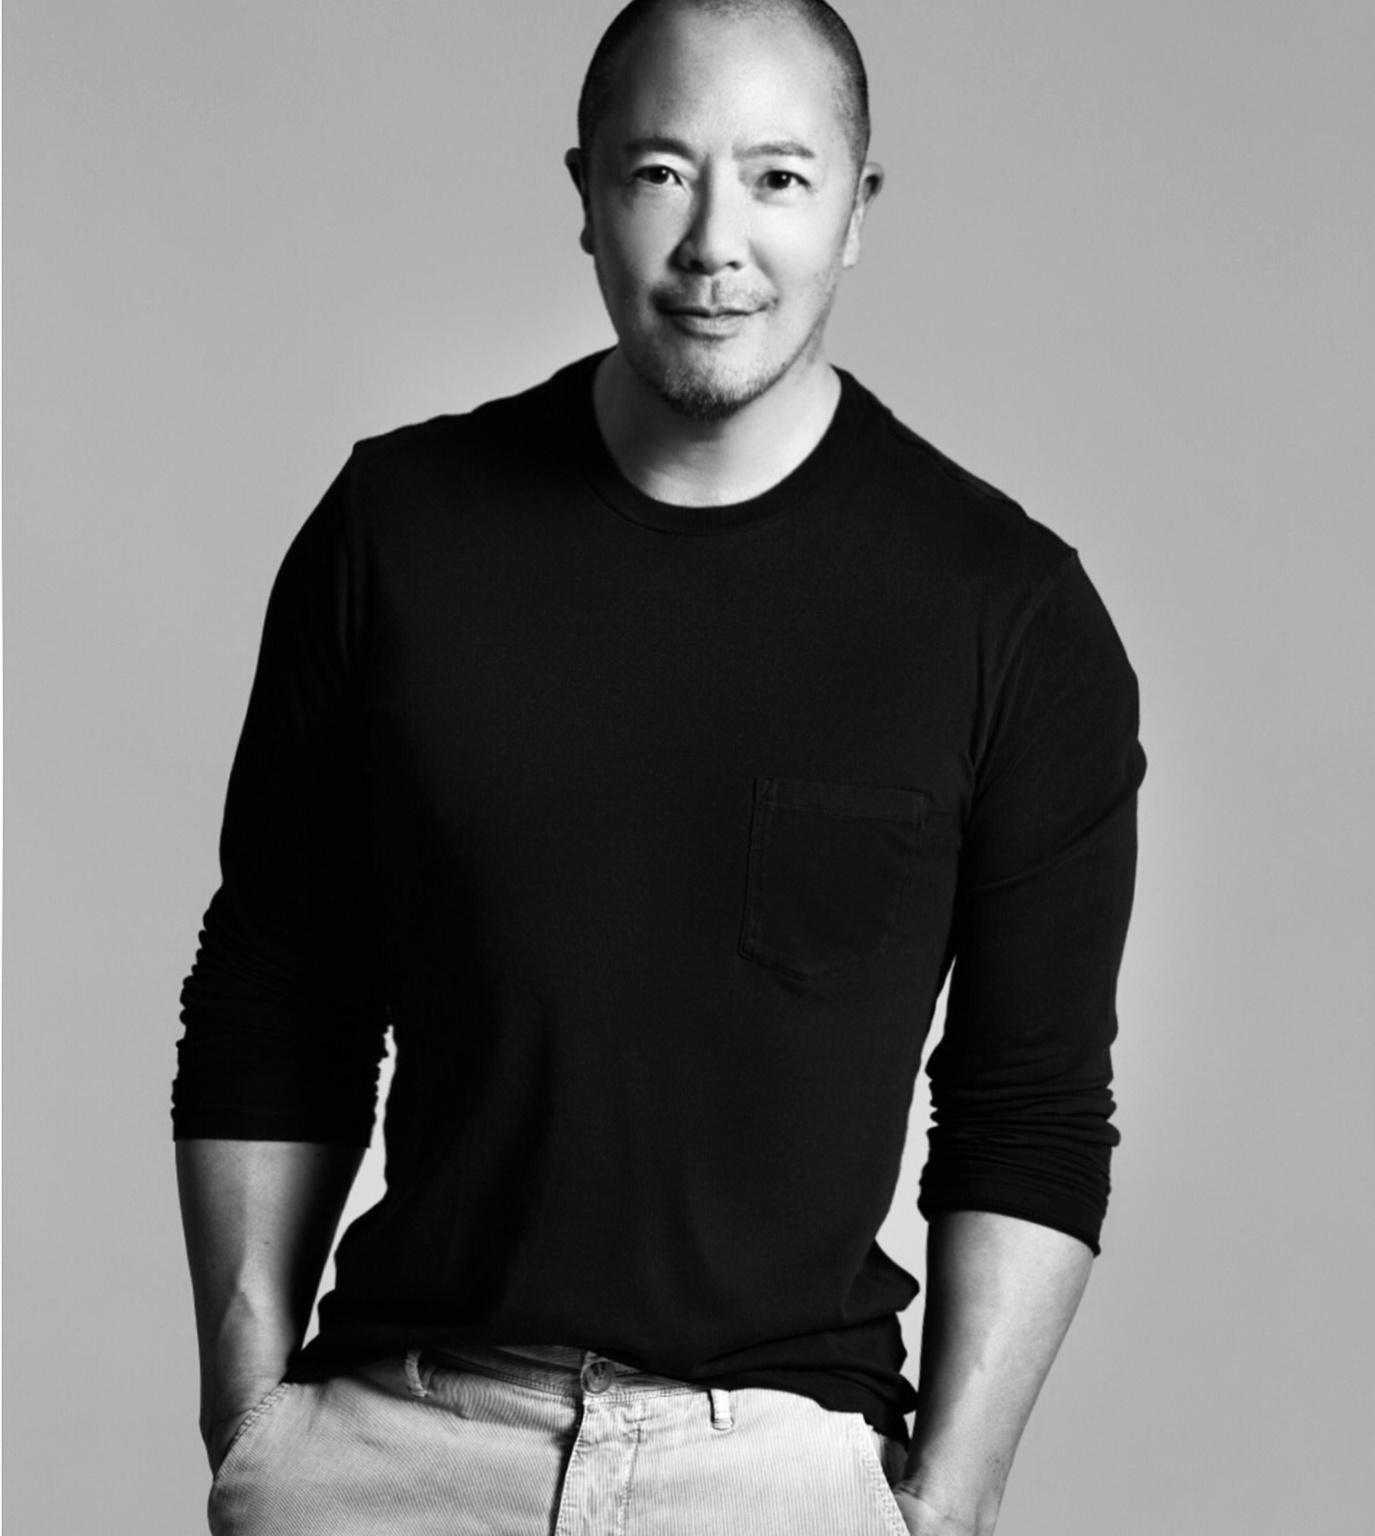 Derek Lam leaning against a wall